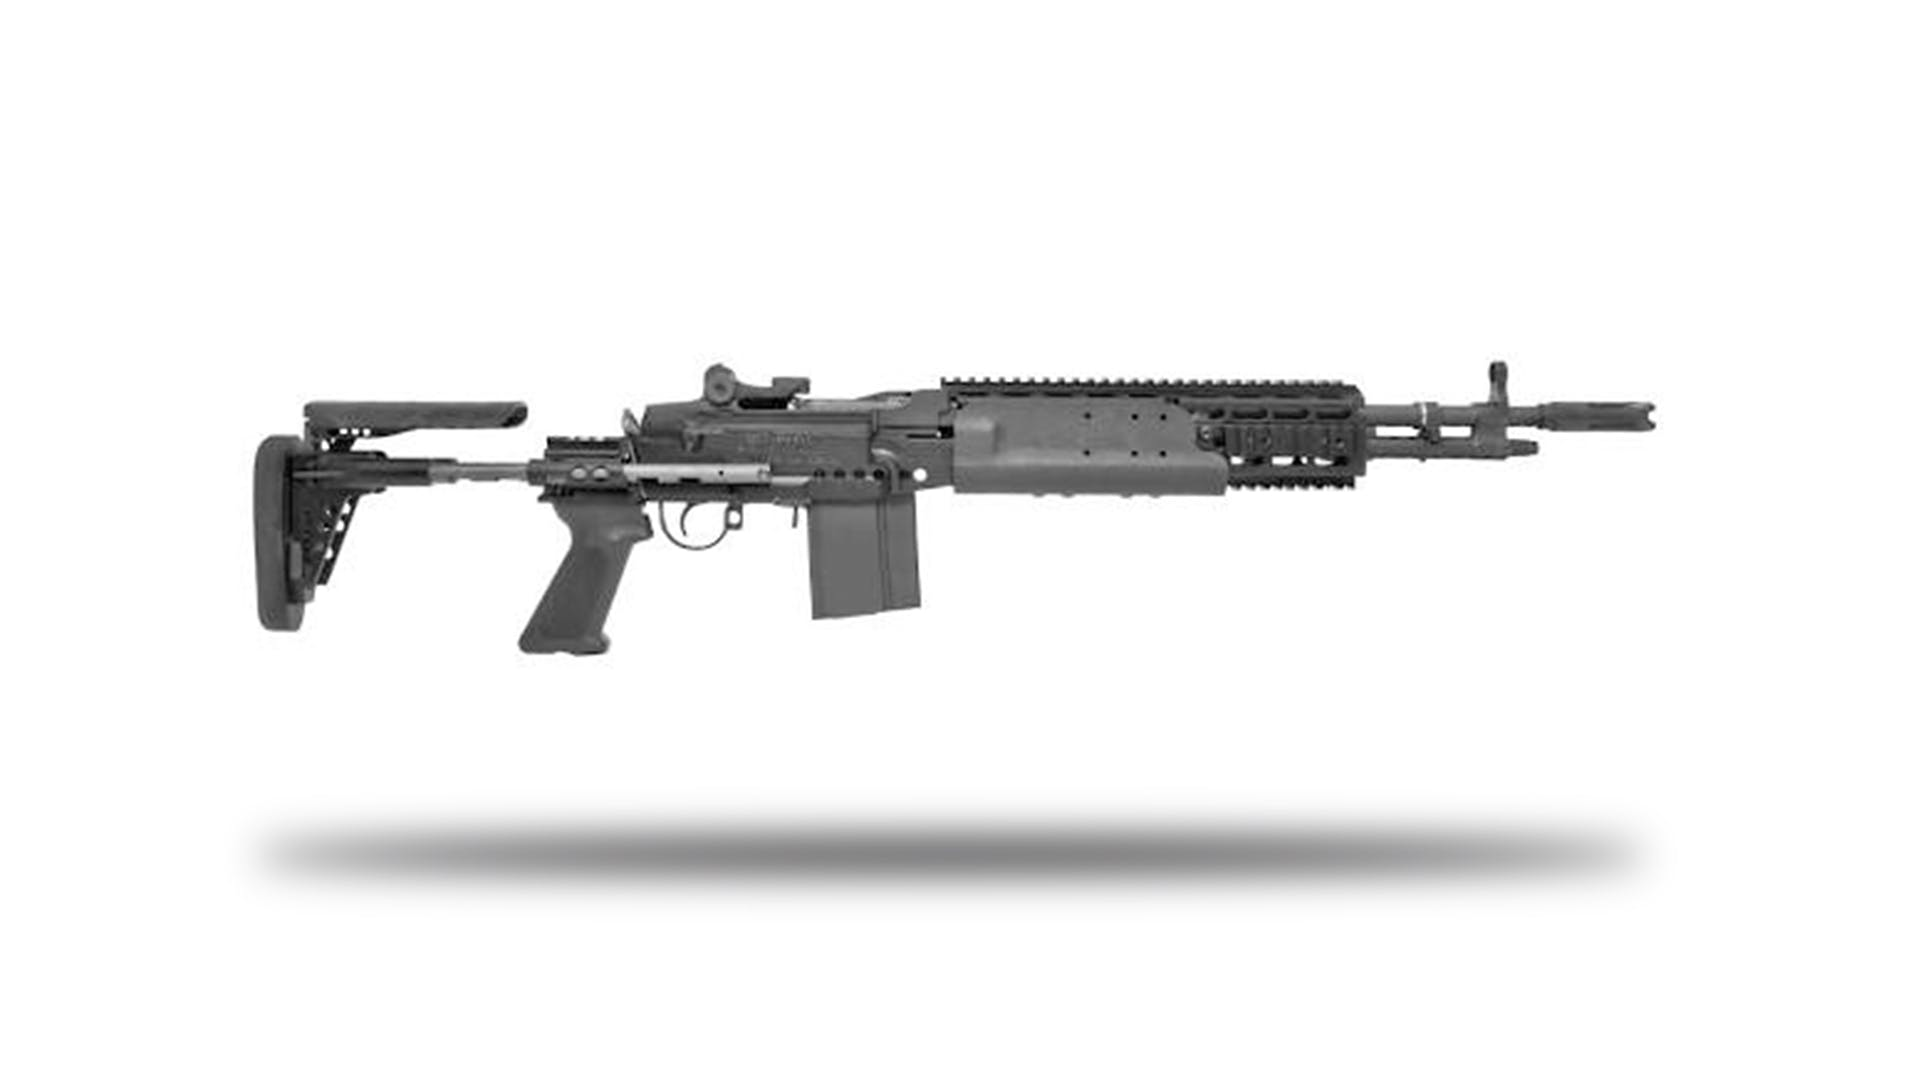 Shoot the M14 EBR Main Battle Rifle | Battlefield Vegas M14 Ebr Rifle